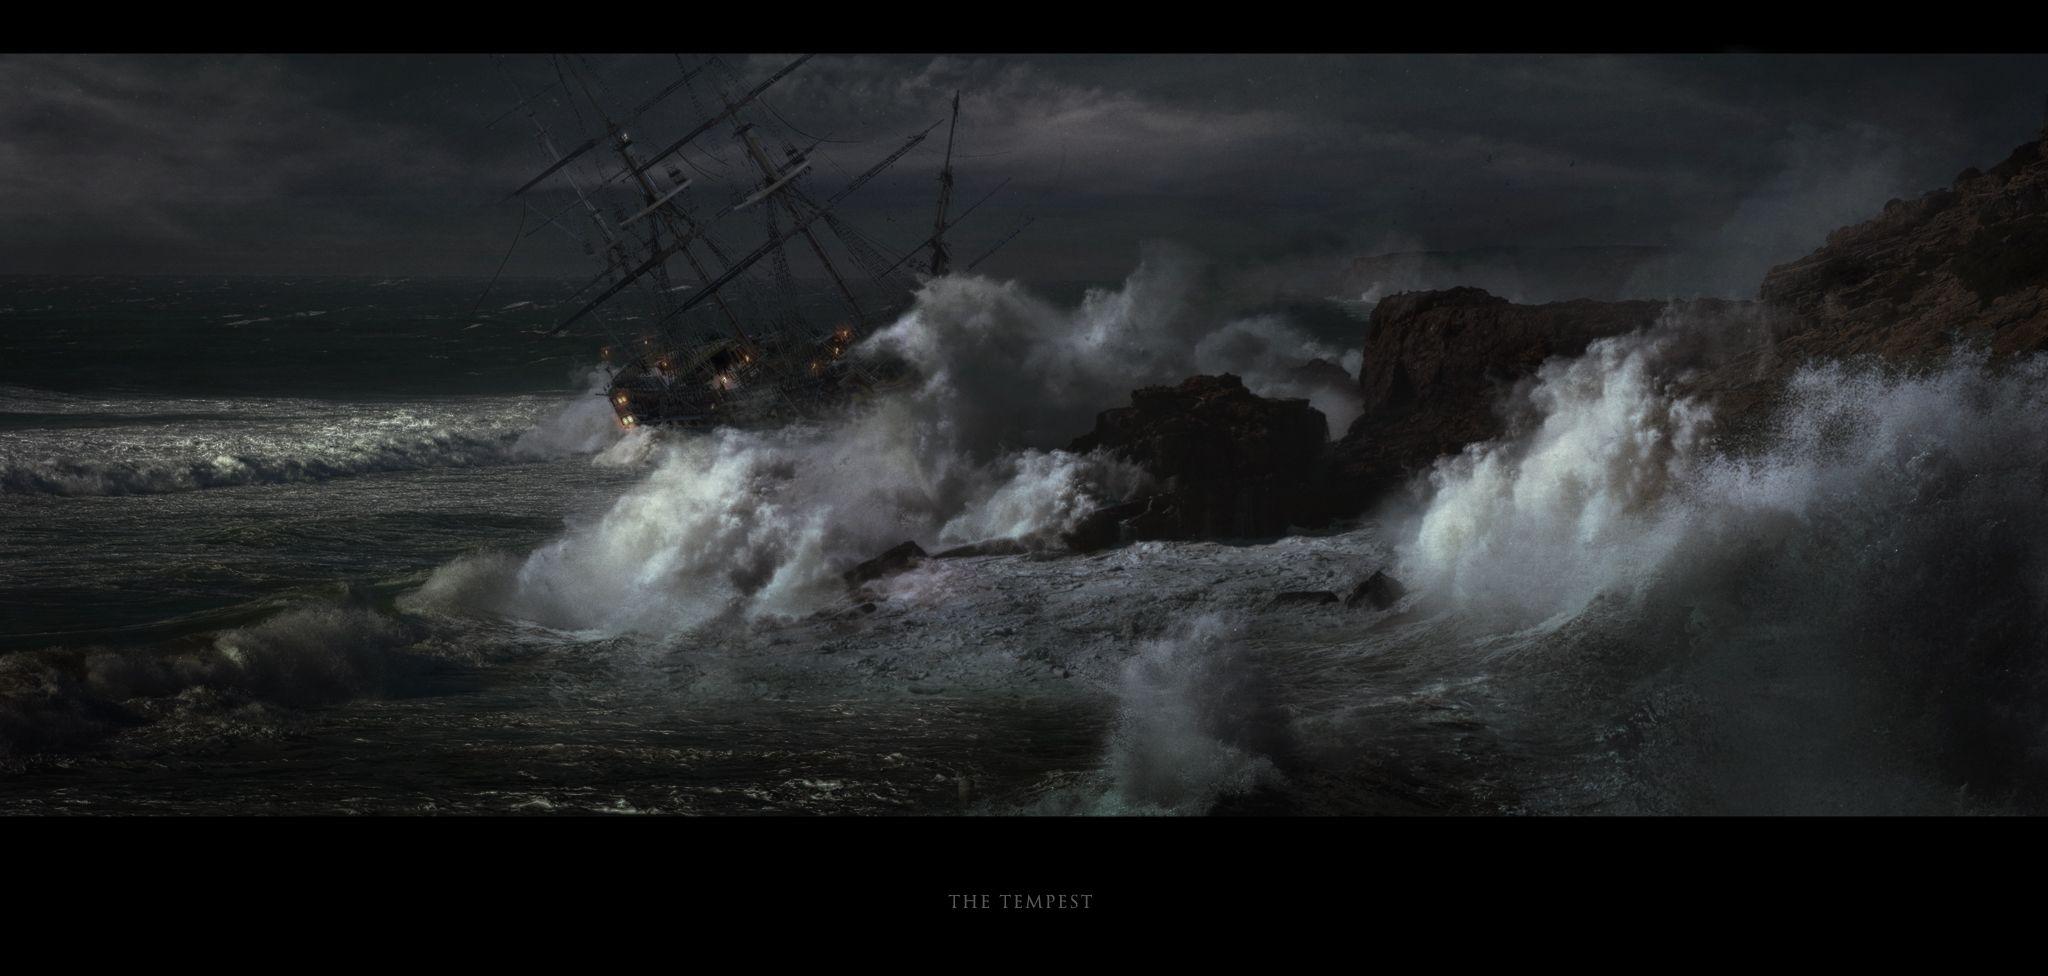 Tempest Picture  (2d, concept art, ship, ocean, boat, storm, waves, wreck, shipwreck, sailing ship, tempest) by Kentaro Kanamoto